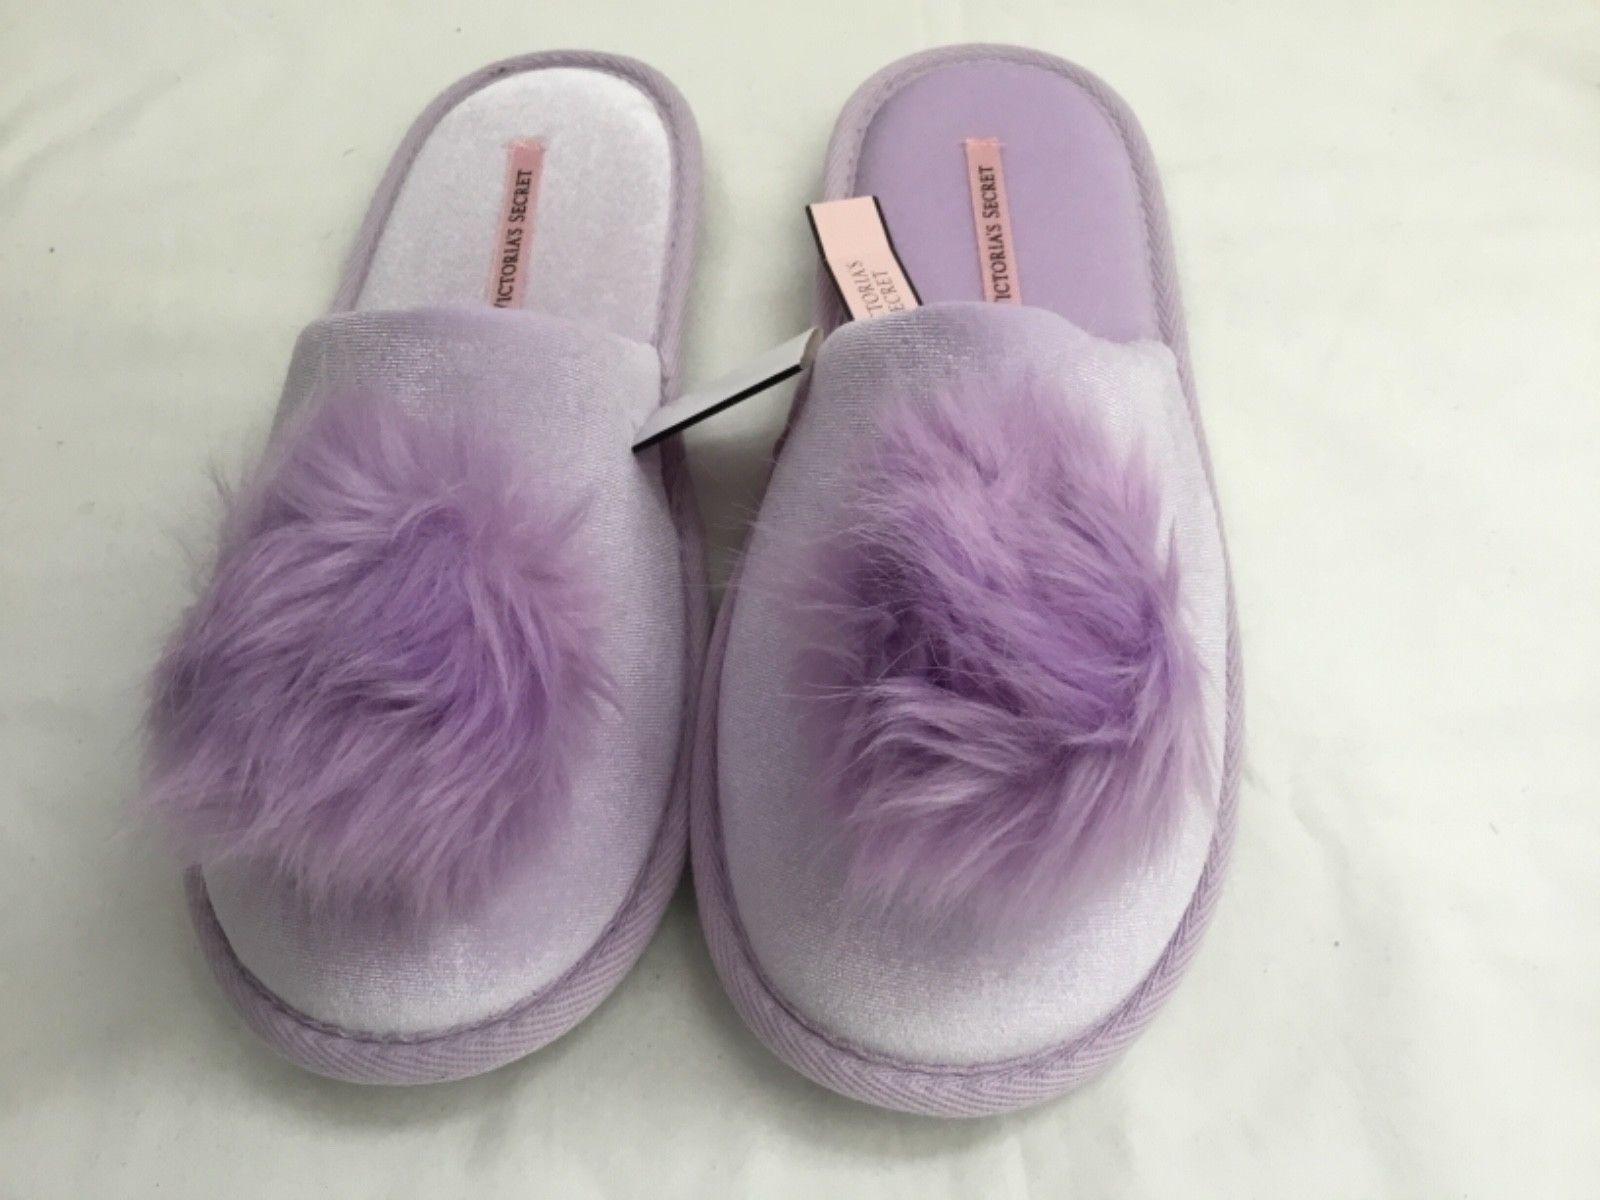 Victoria's Secret  Womens Dreamy Lavendar Pom Pom Velvet Slippers Size M(7-8)